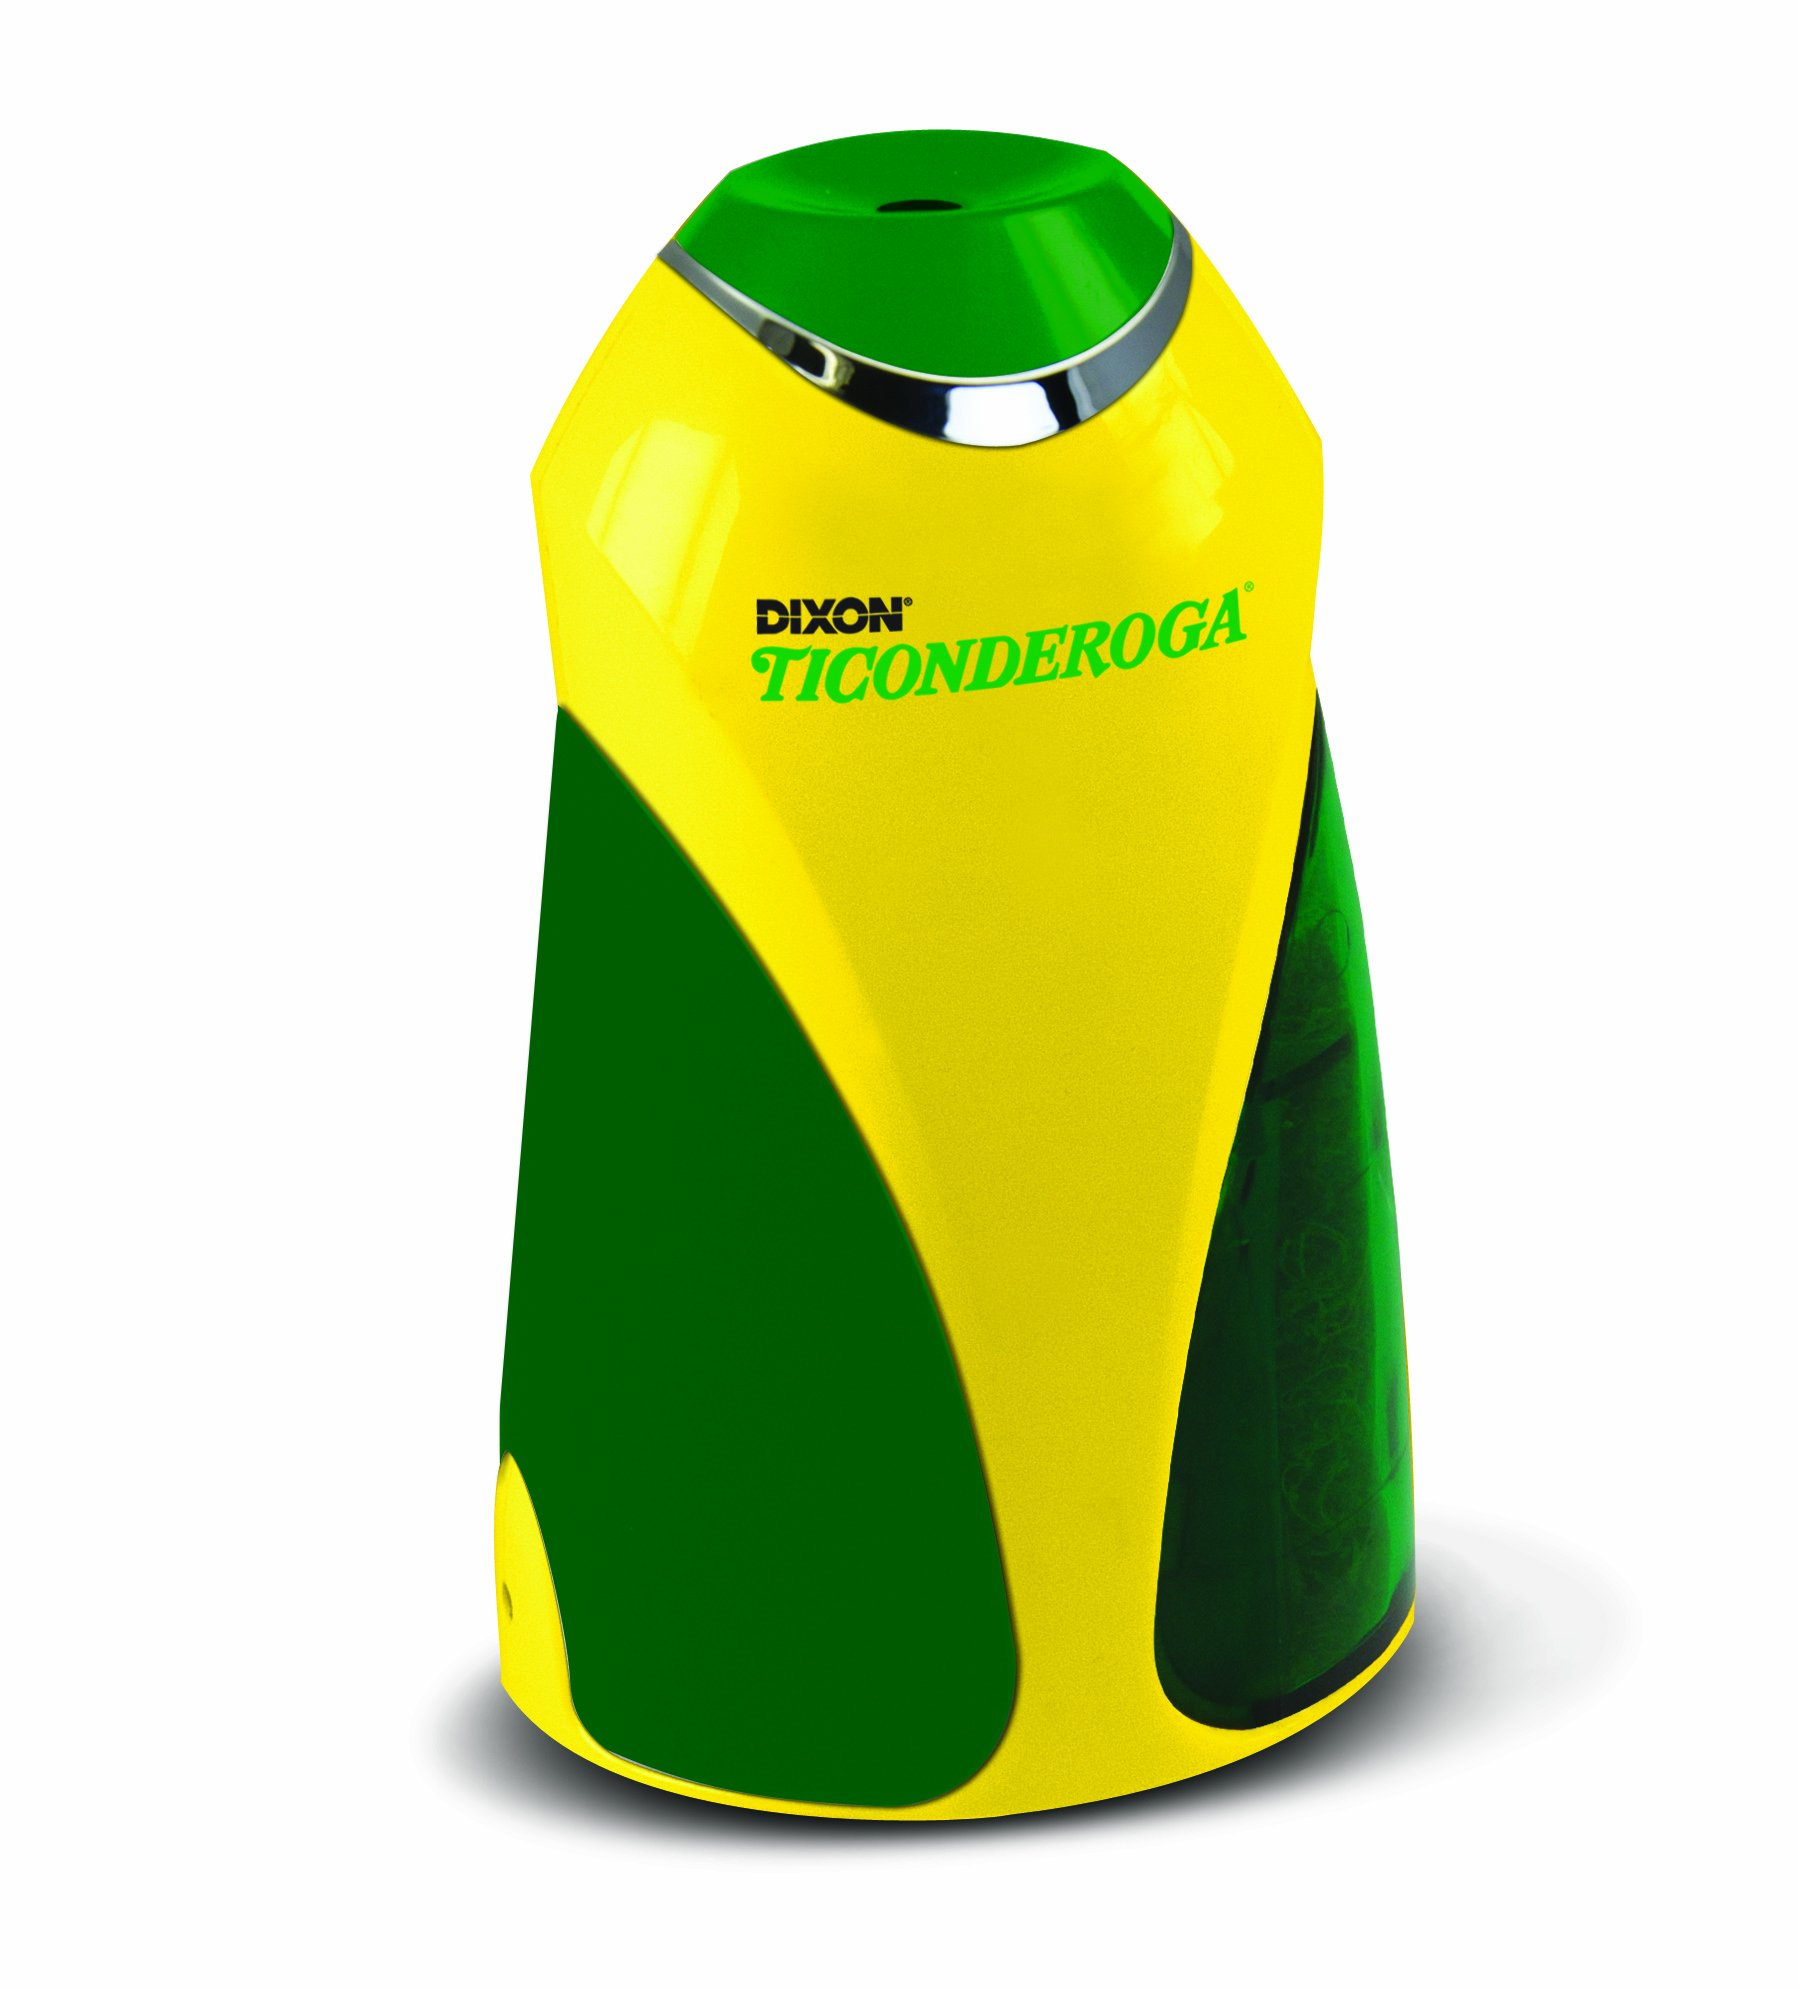 Ticonderoga Personal Electric Pencil Sharpener, Vertical, Yellow and Green, Plus 12 Ticonderoga Pencils (39571) by Dixon